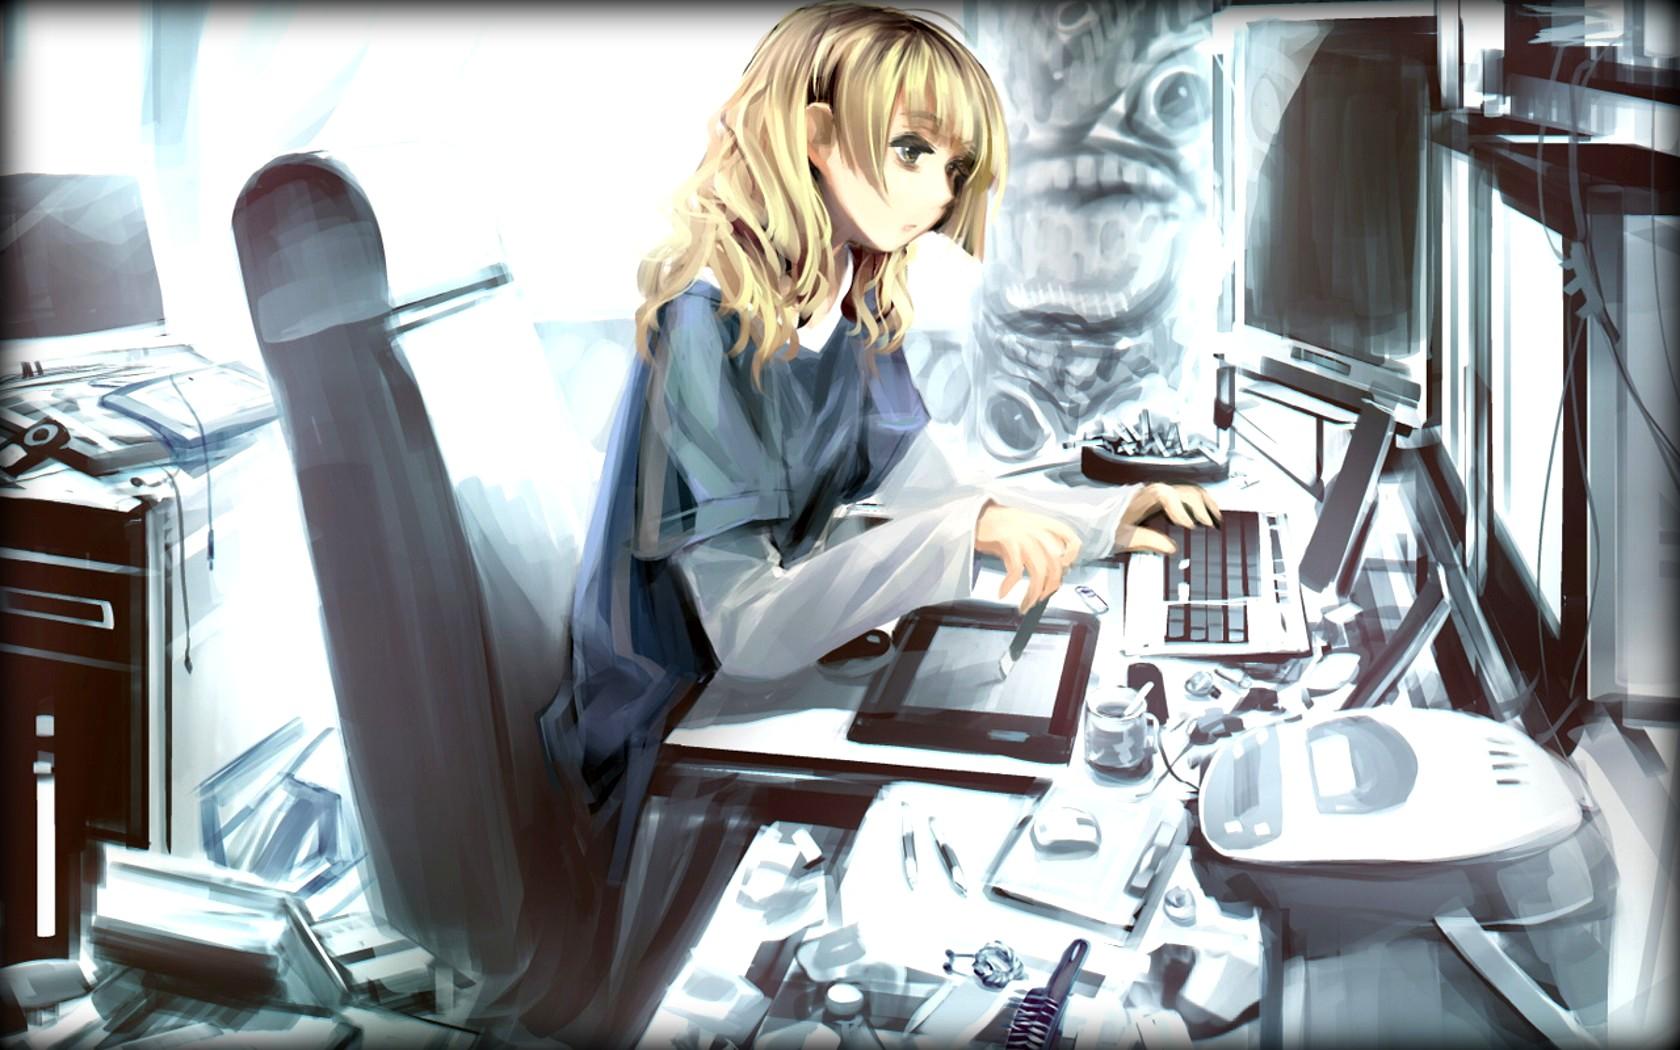 Computer Girl 8